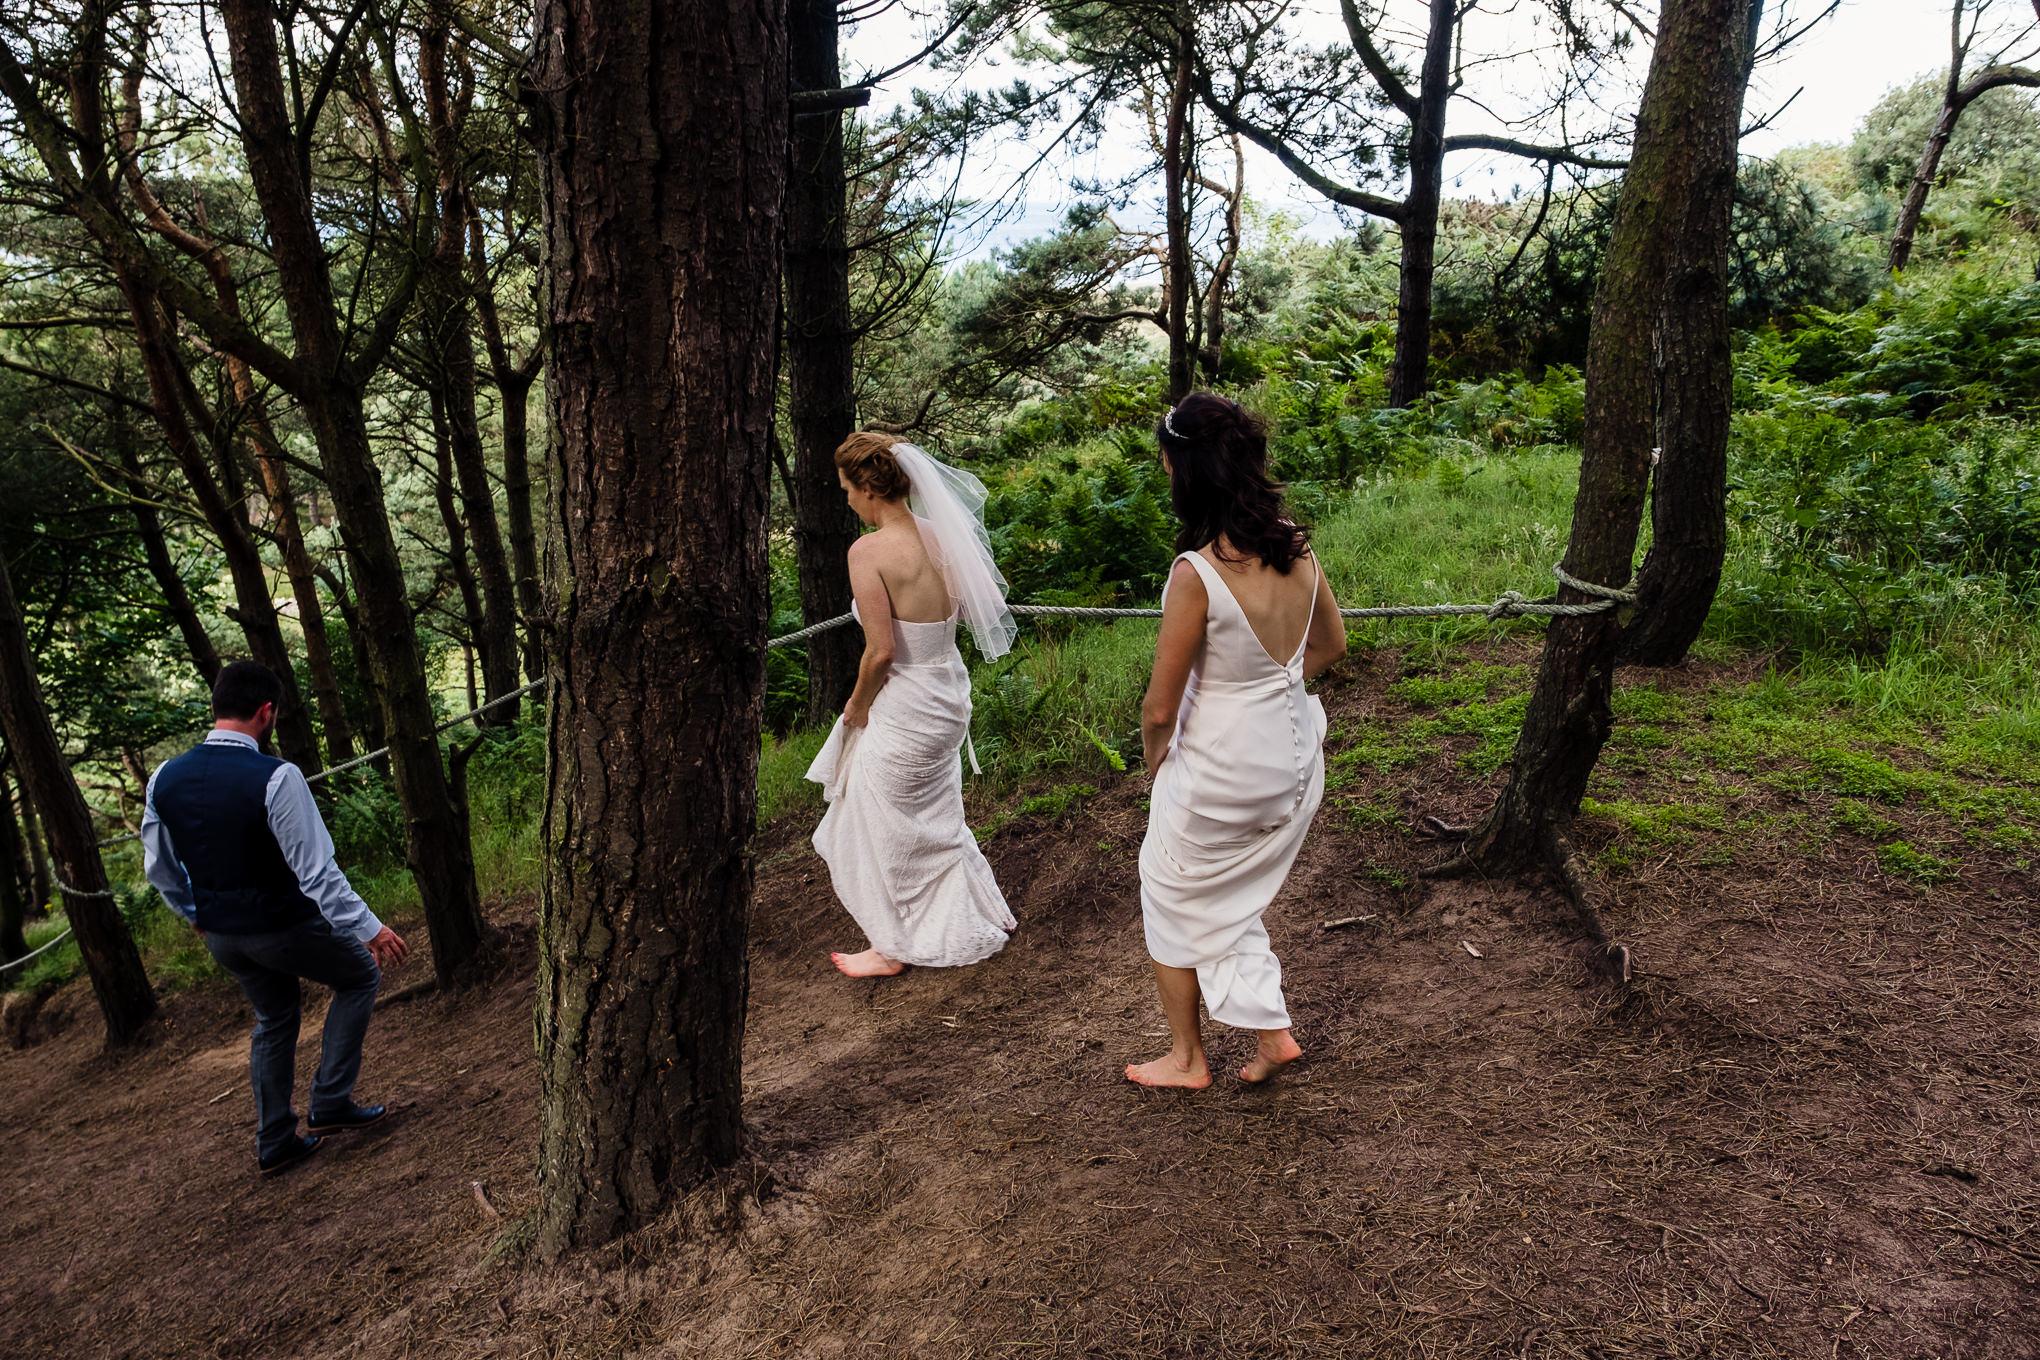 20170729_Ravensheugh Log Cabin Wedding_003.jpg